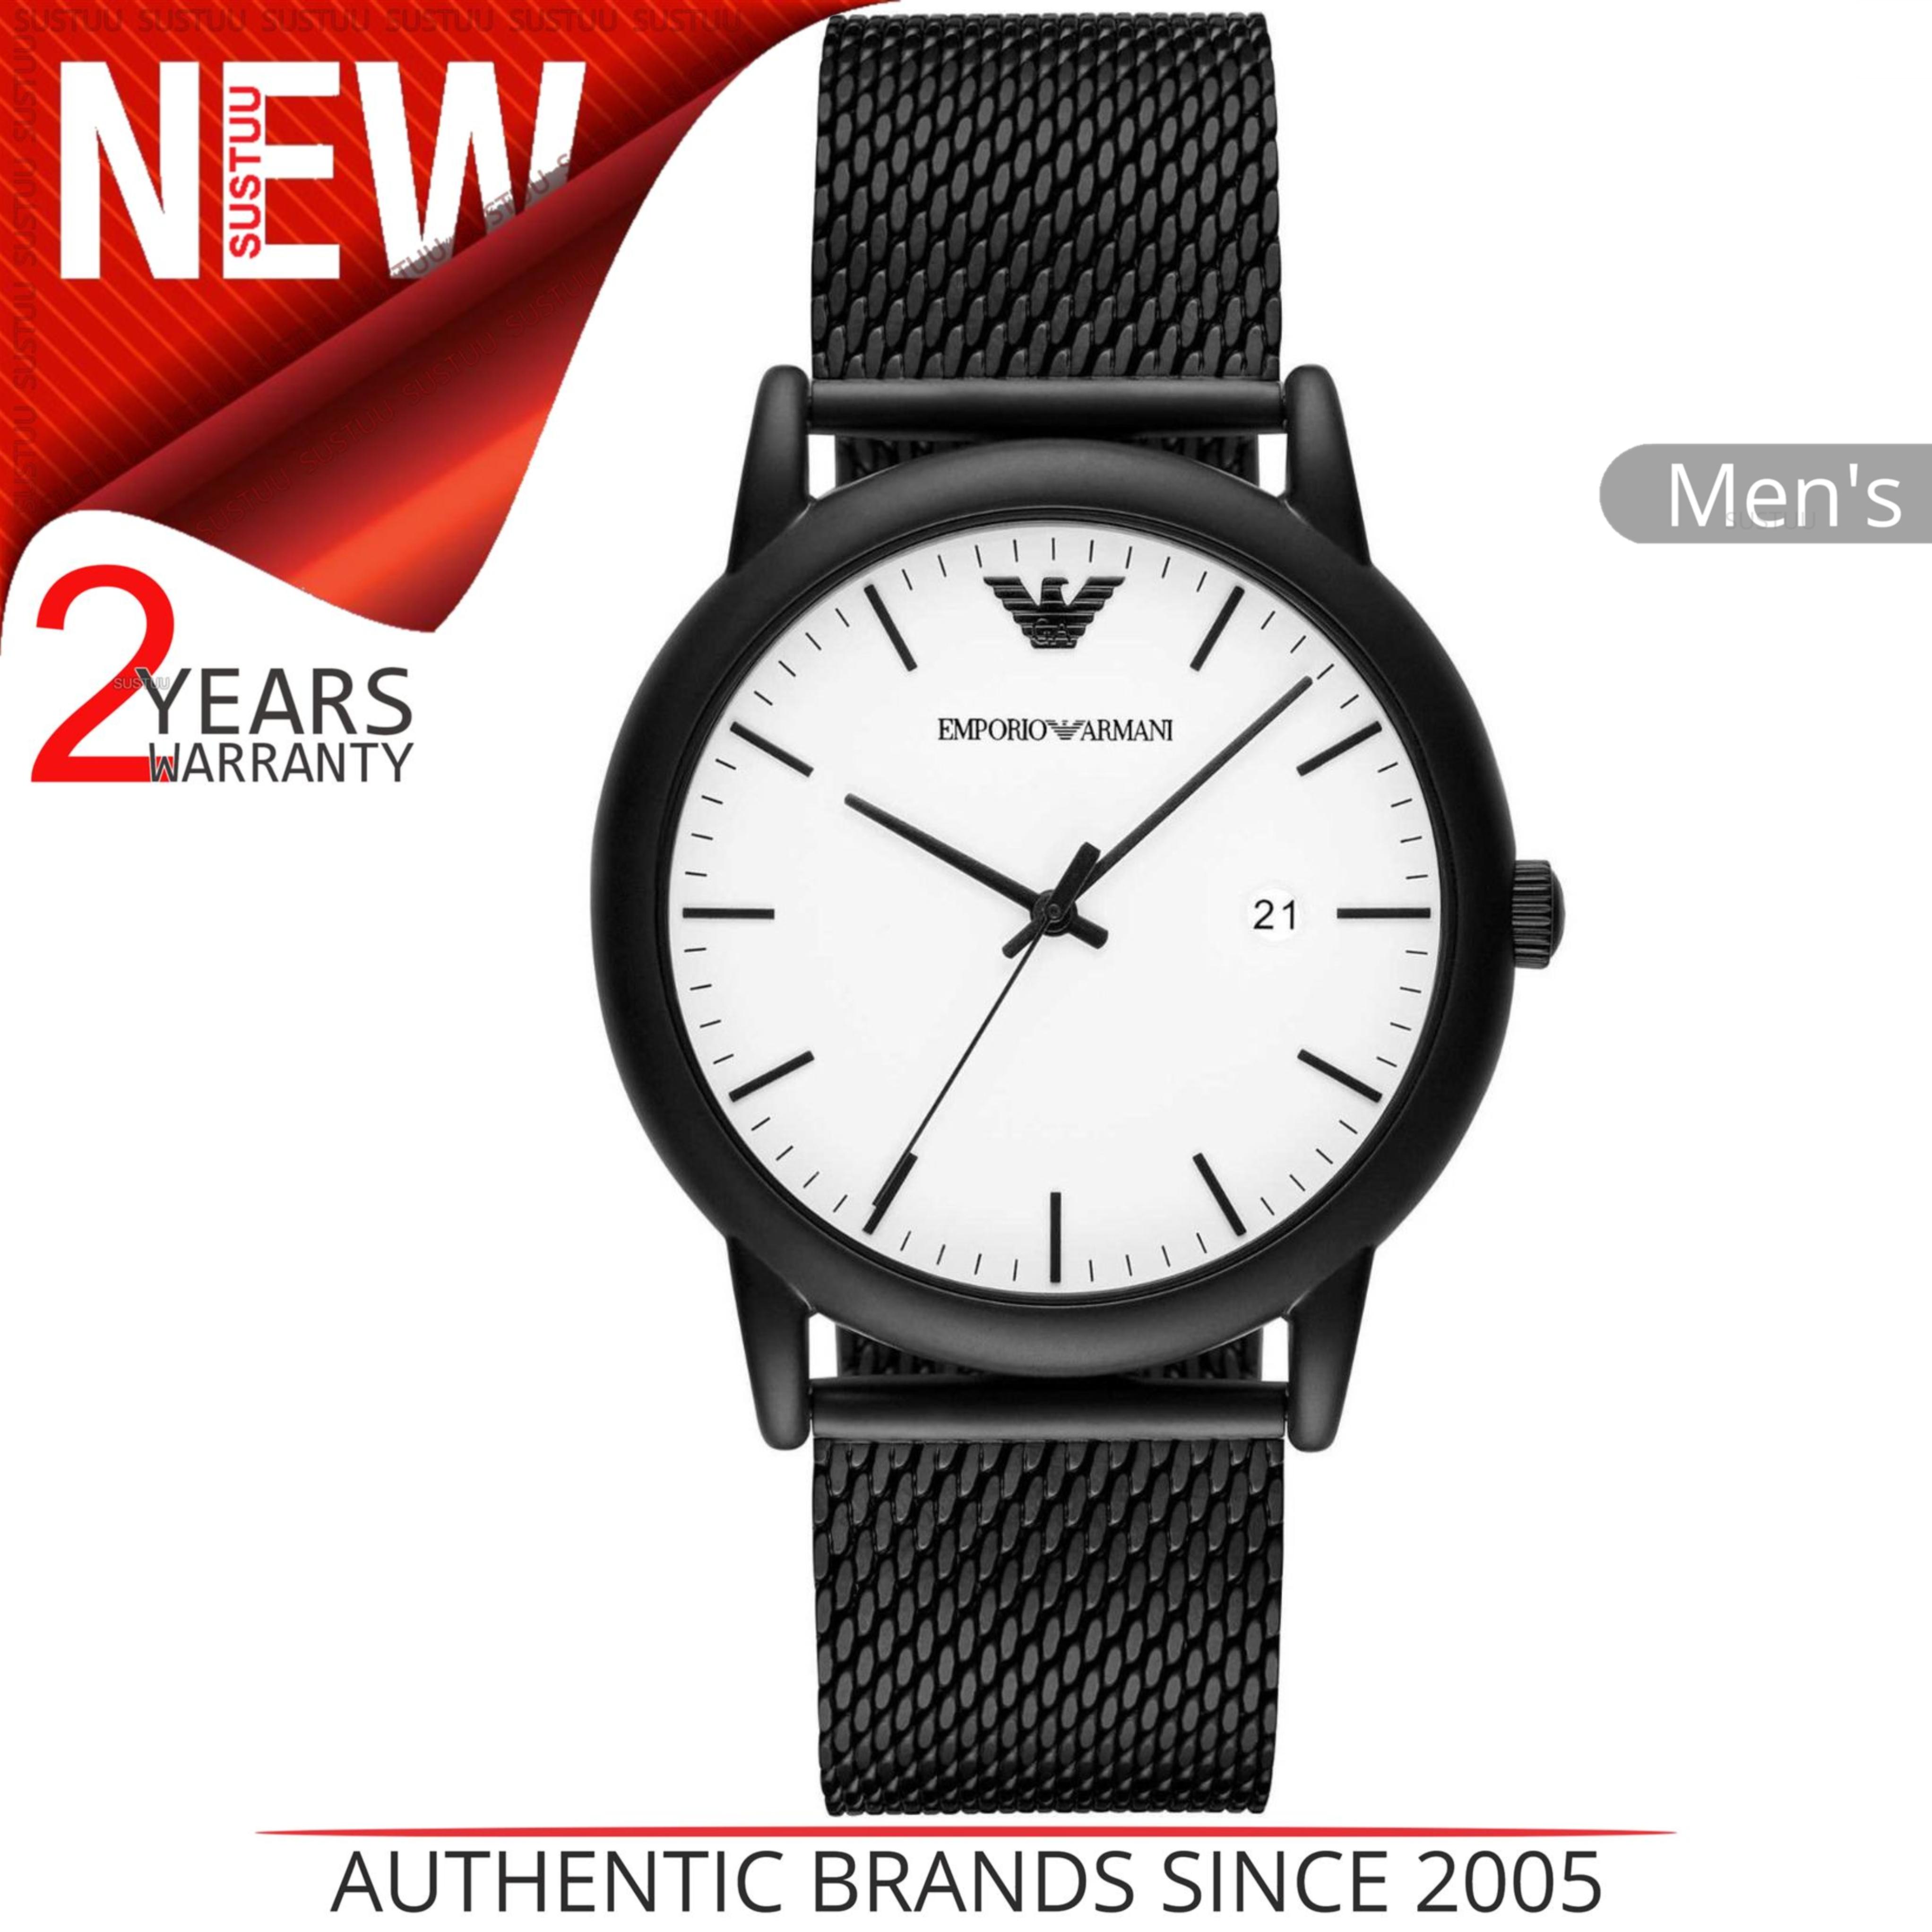 cc19f8afc3dc0 Details about Emporio Armani Luigi Men s Wrist Watch│White Dial│Black Mesh  Matel Strap│AR11046